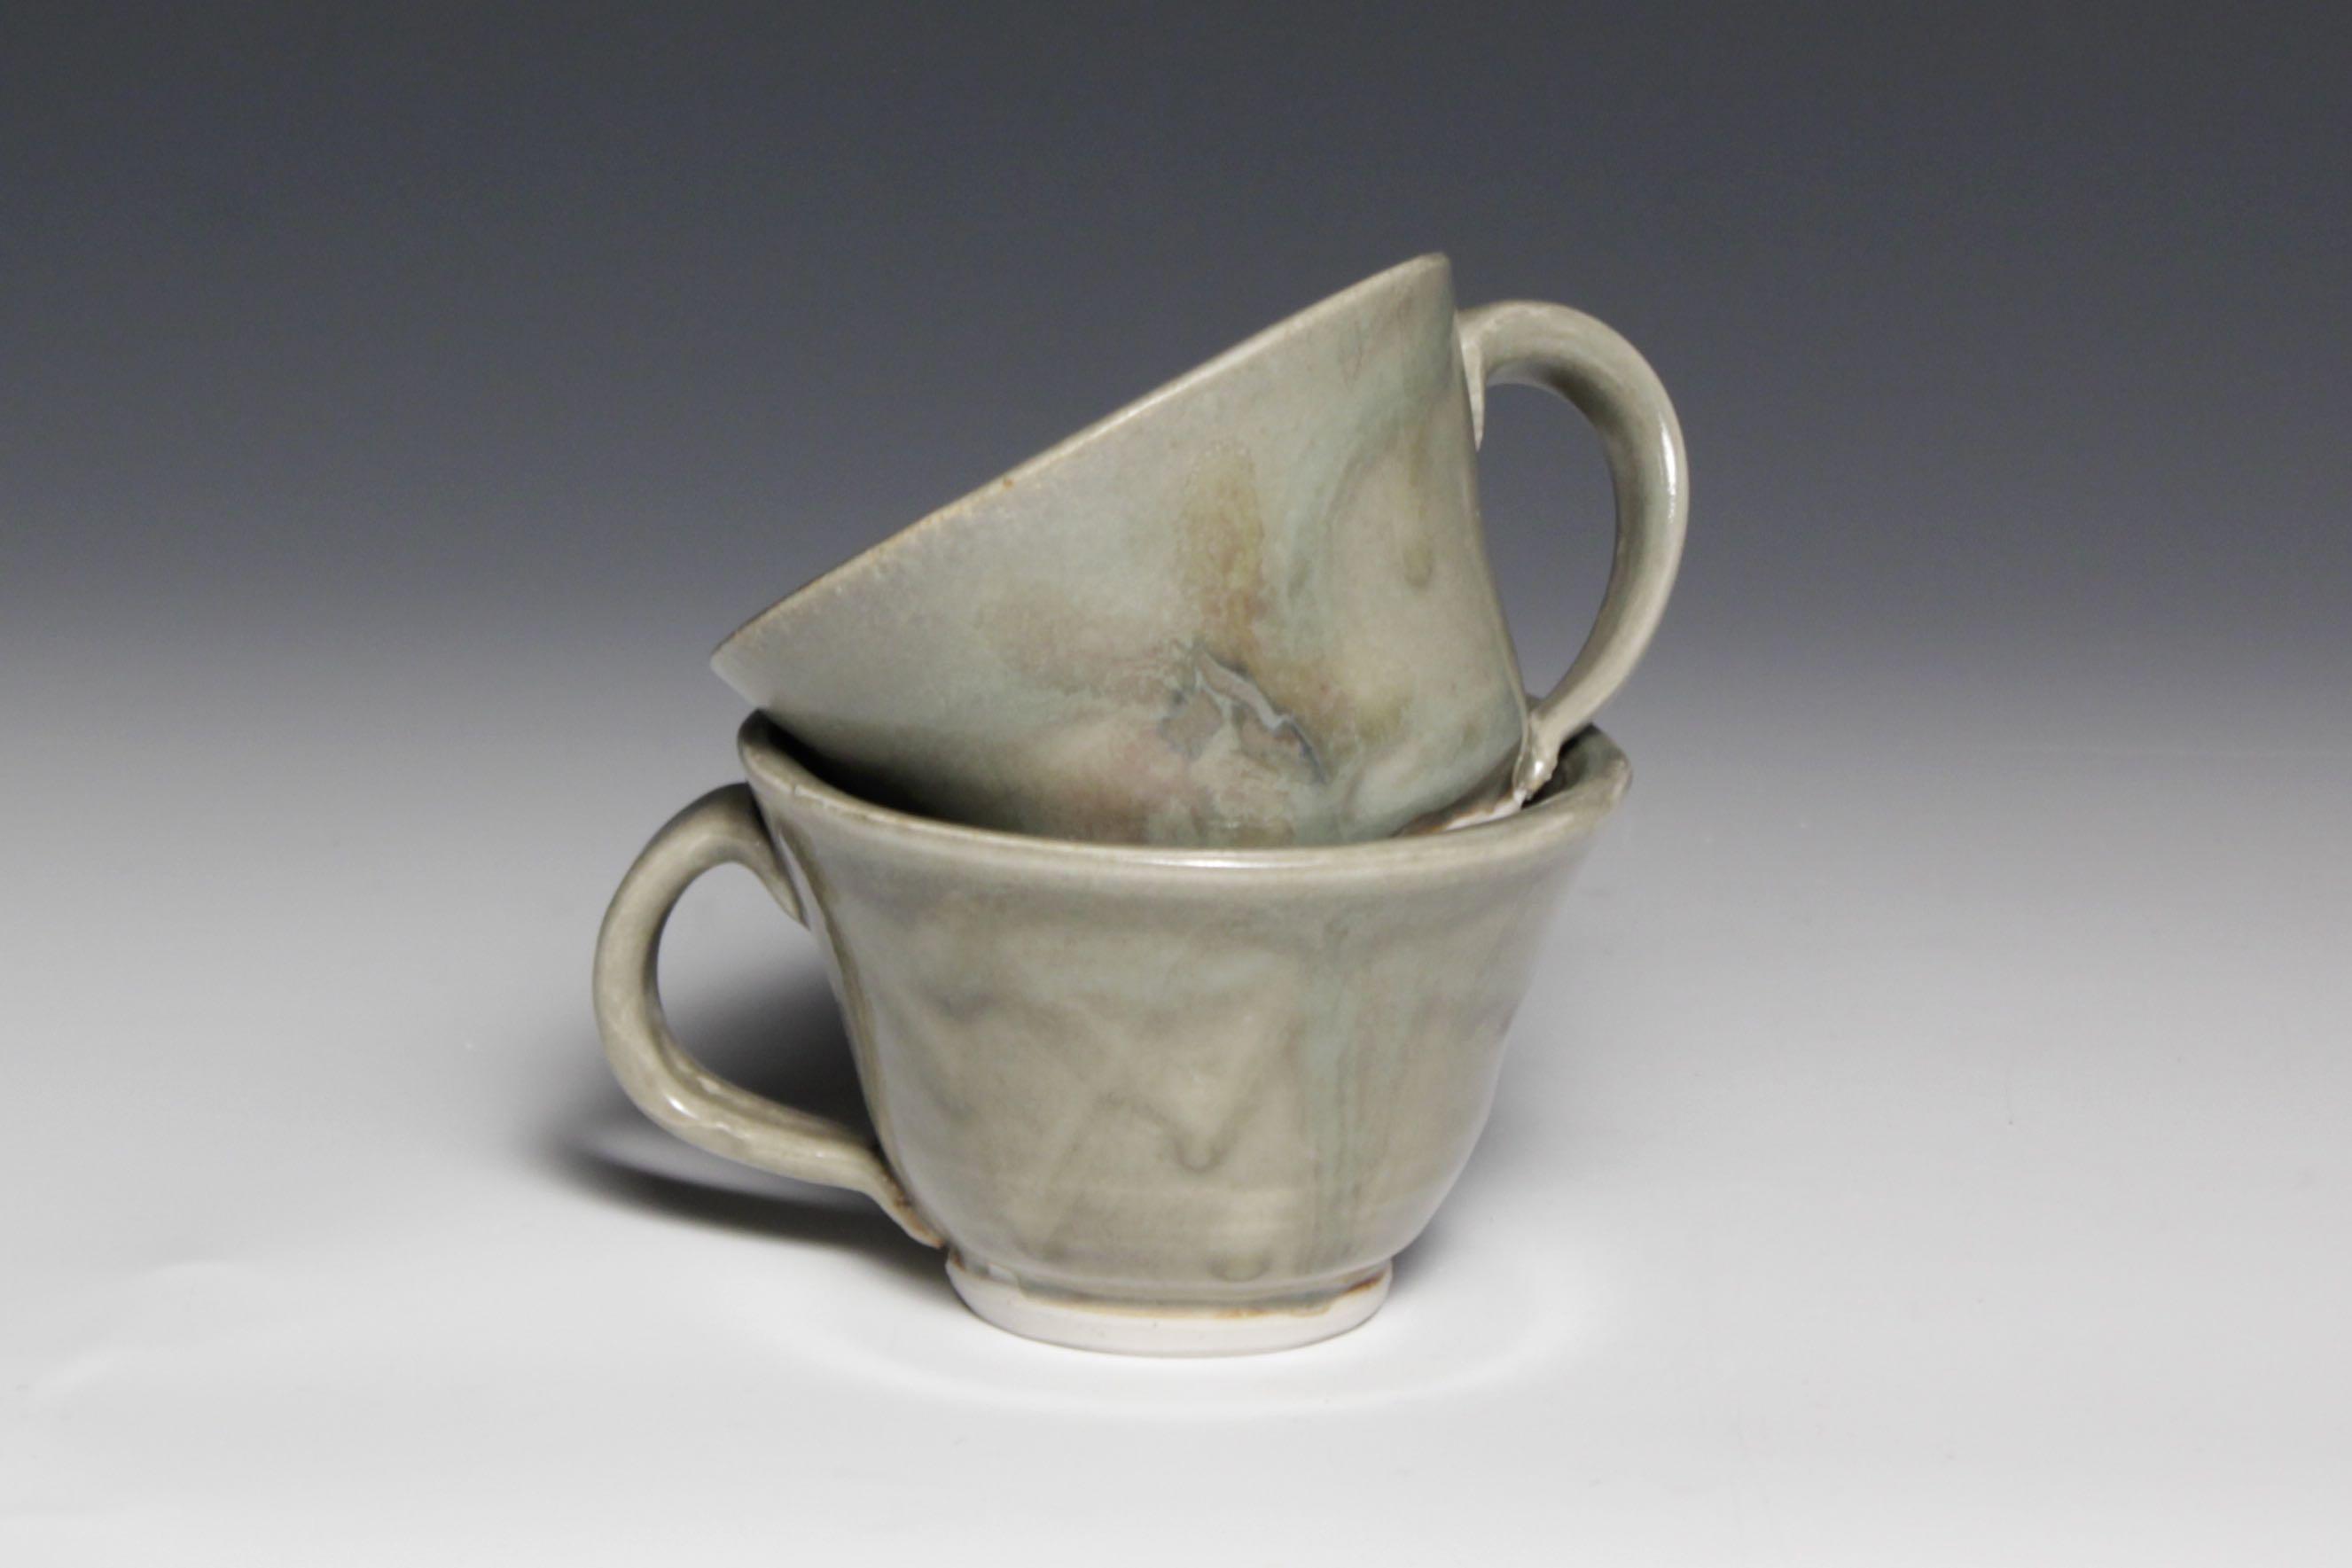 Green Teacups